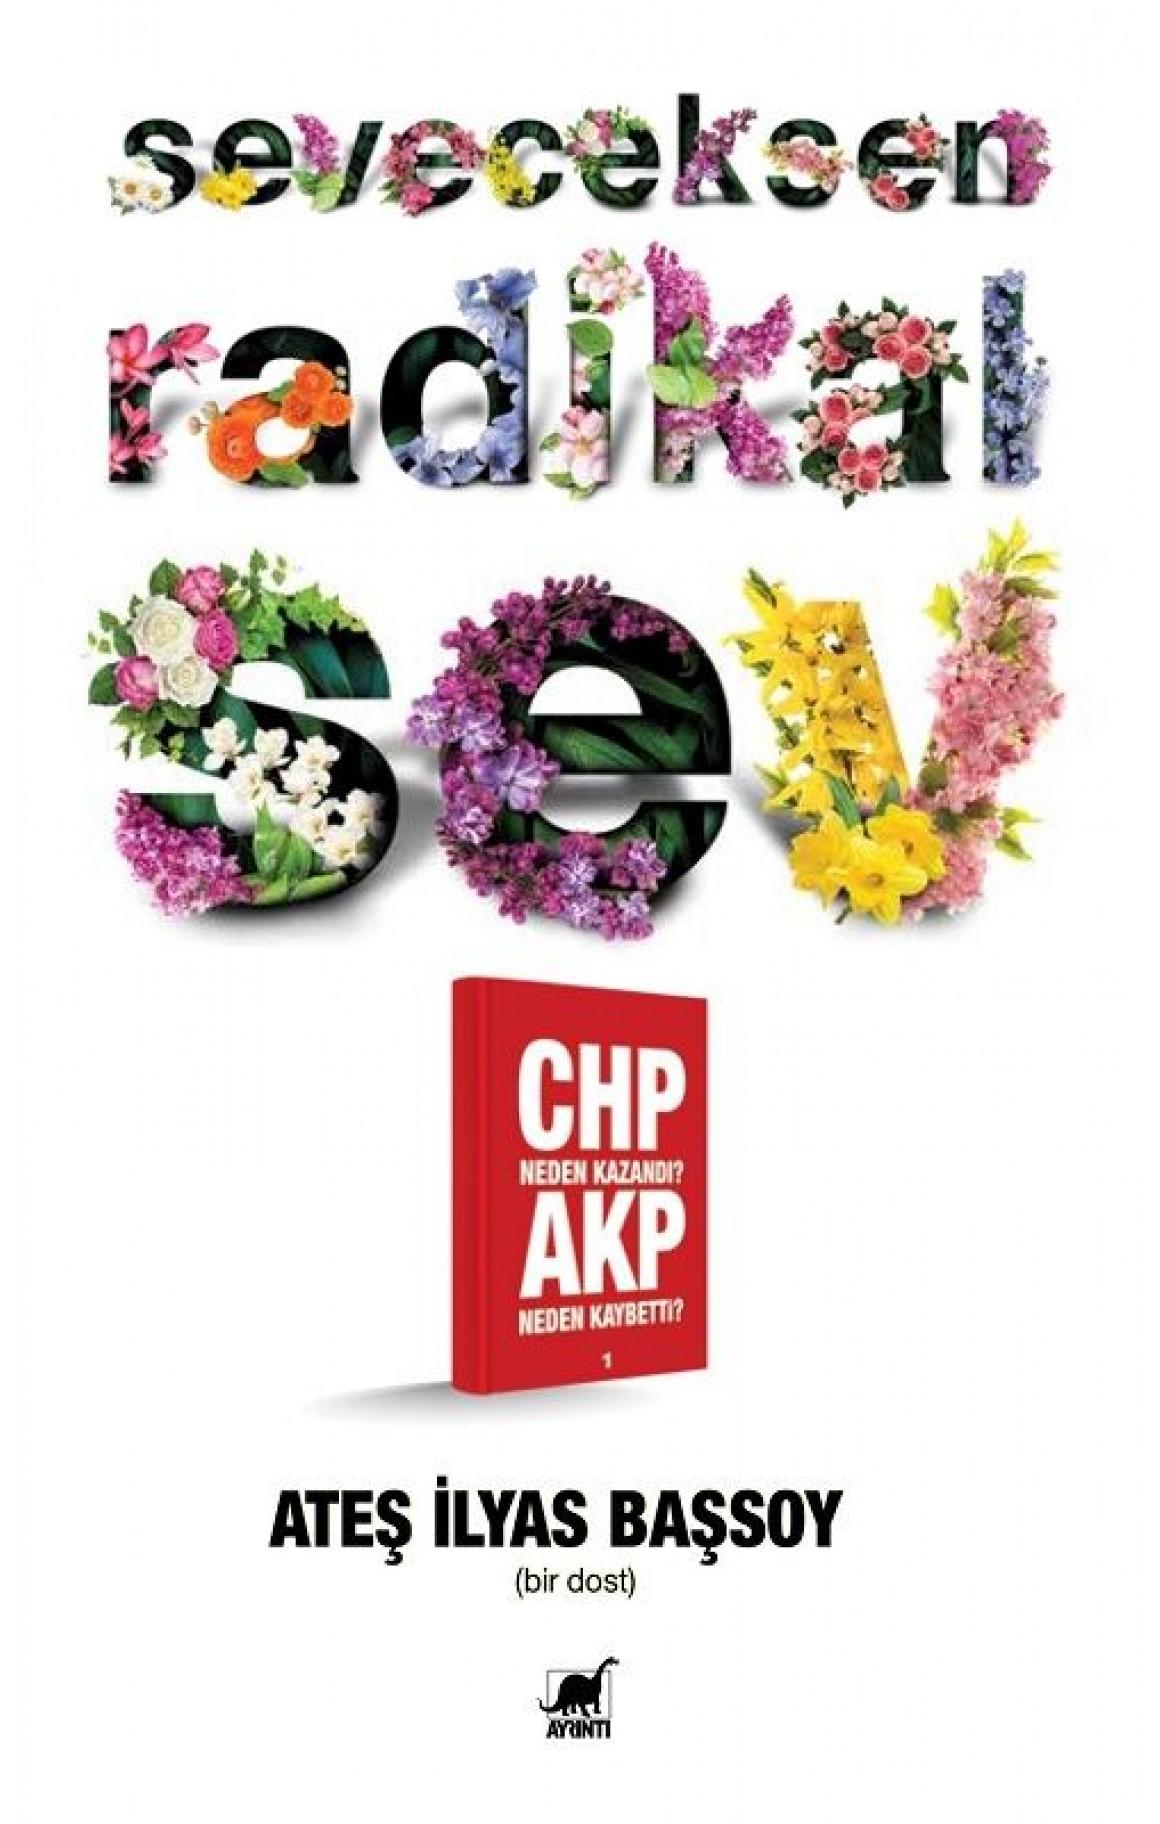 Seveceksen Radikal Sev - CHP Neden Kazandı? AKP Neden Kaybetti?